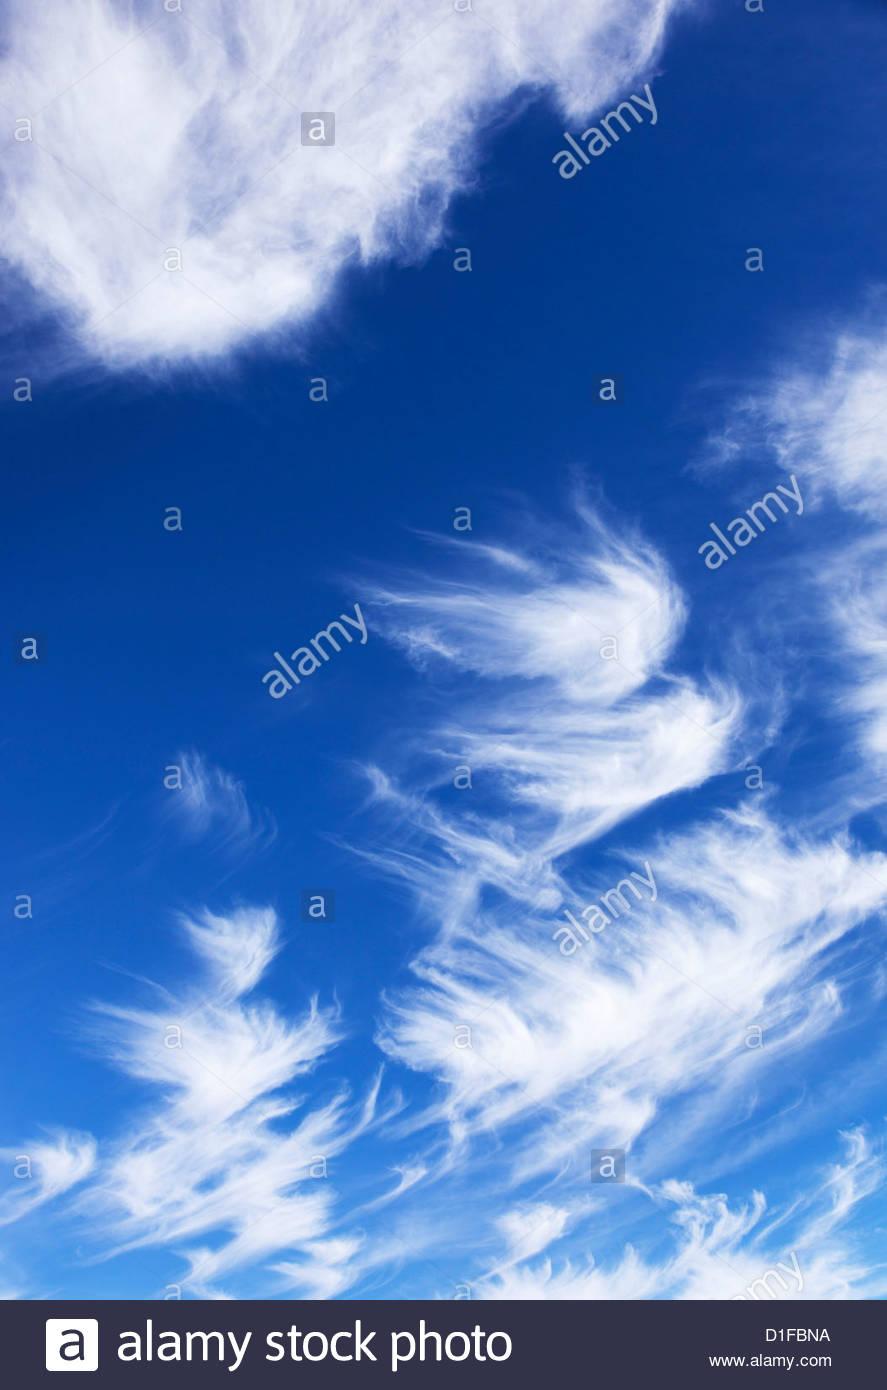 Thin wispy white clouds blue sky - Stock Image